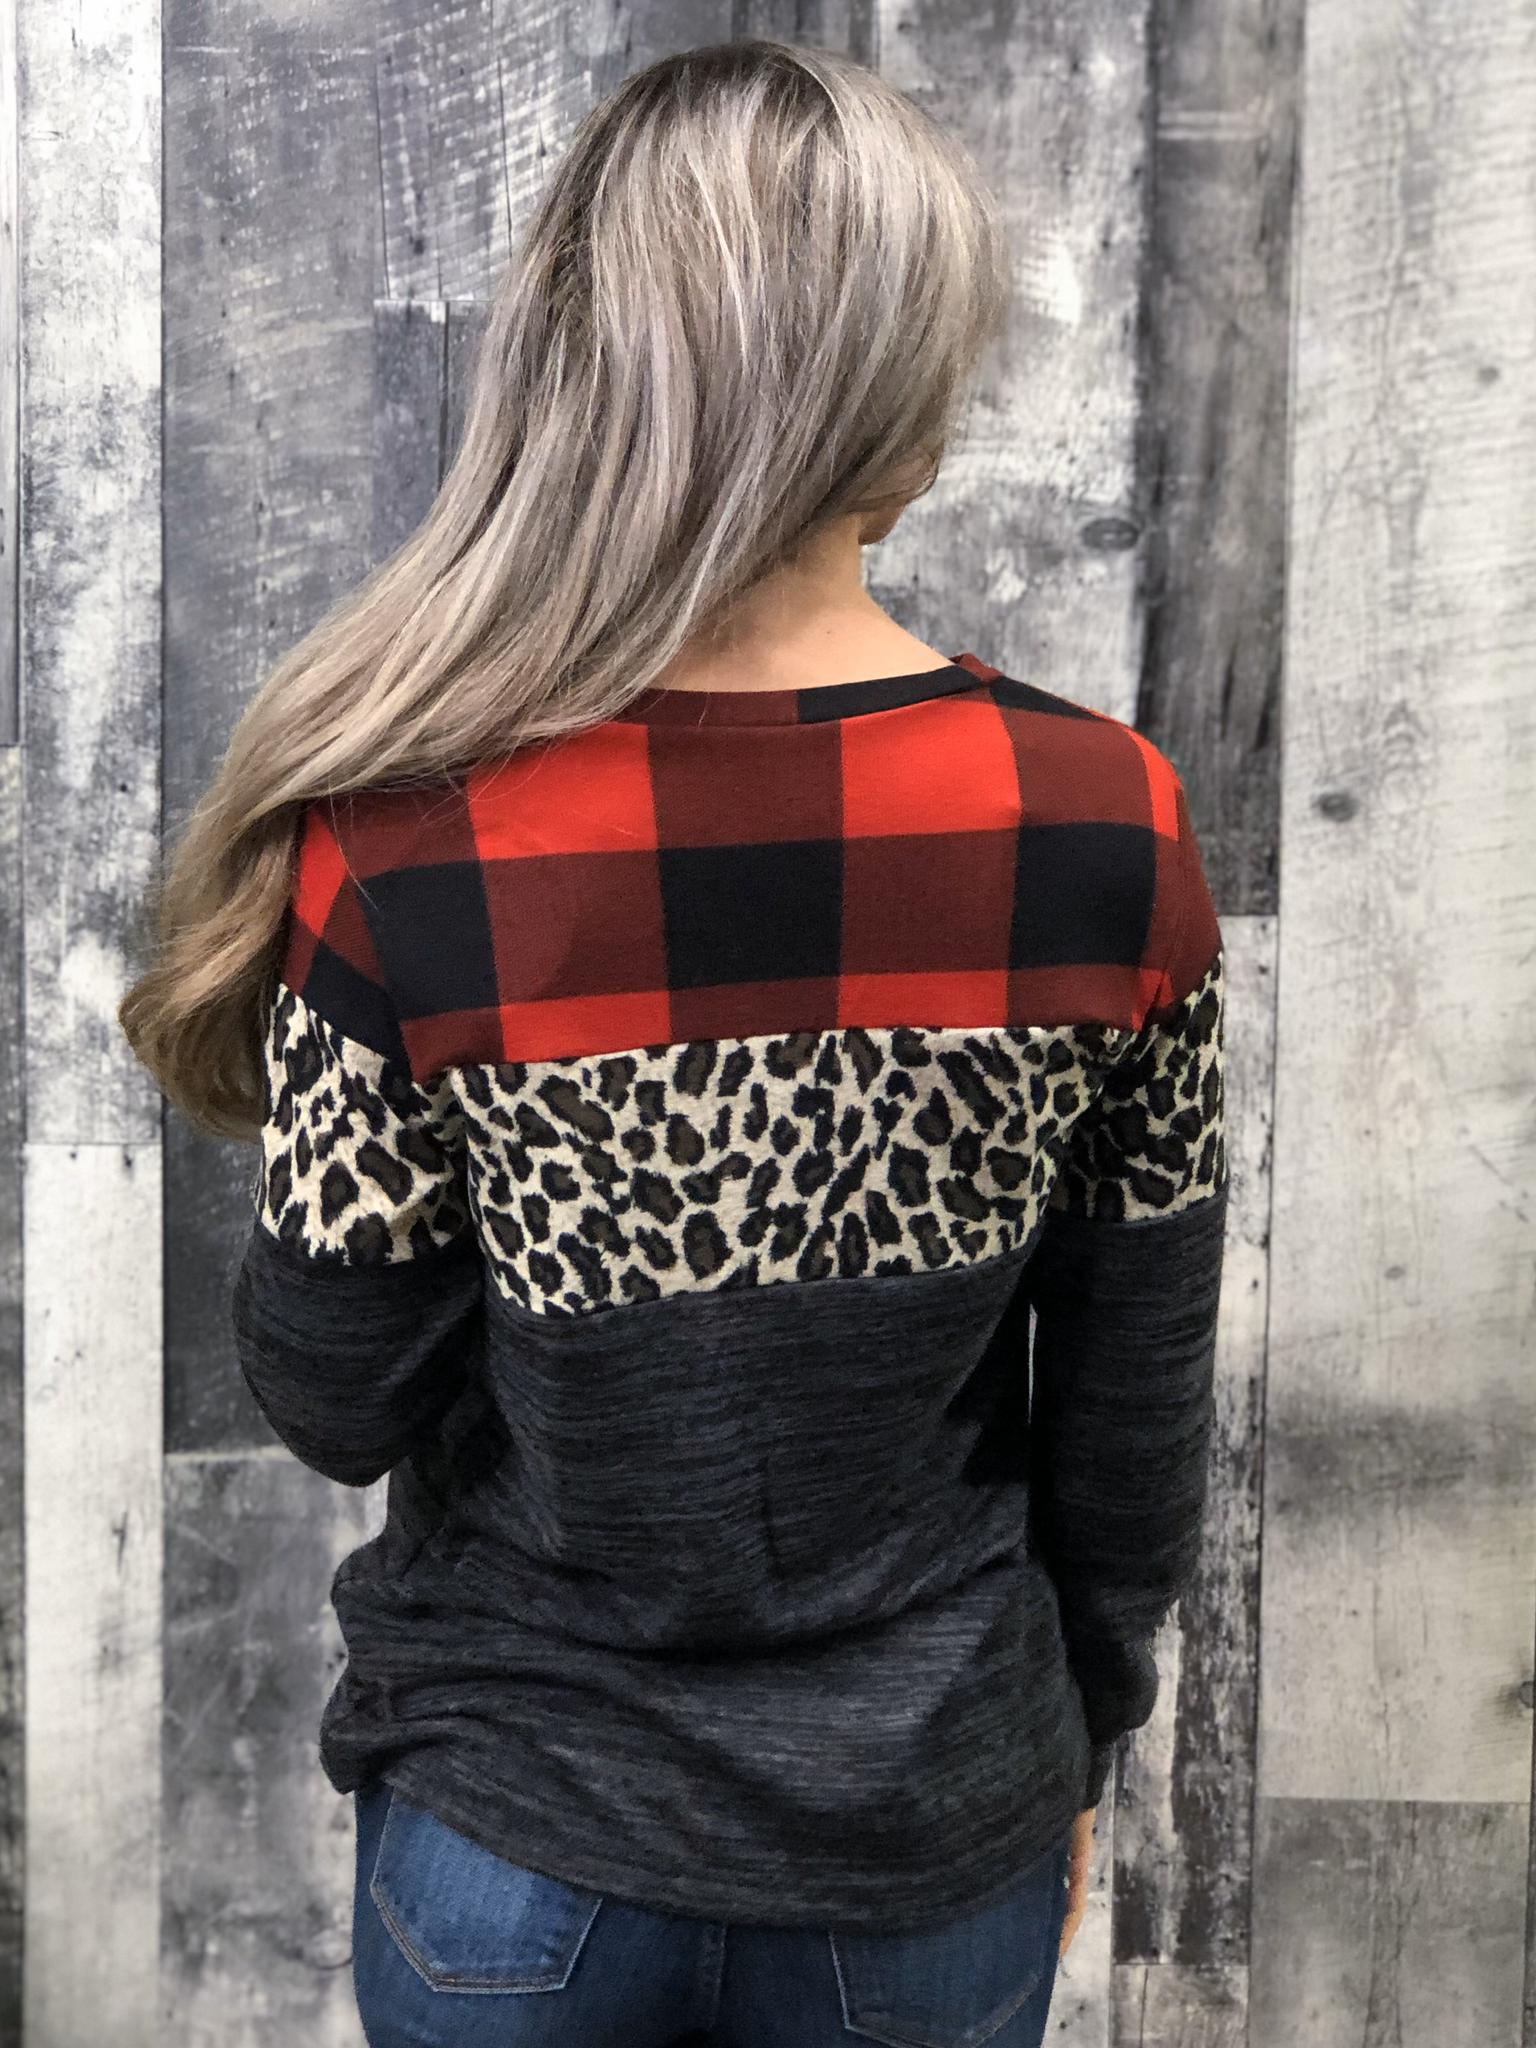 Buffalo Plaid Cheetah Color Block Top